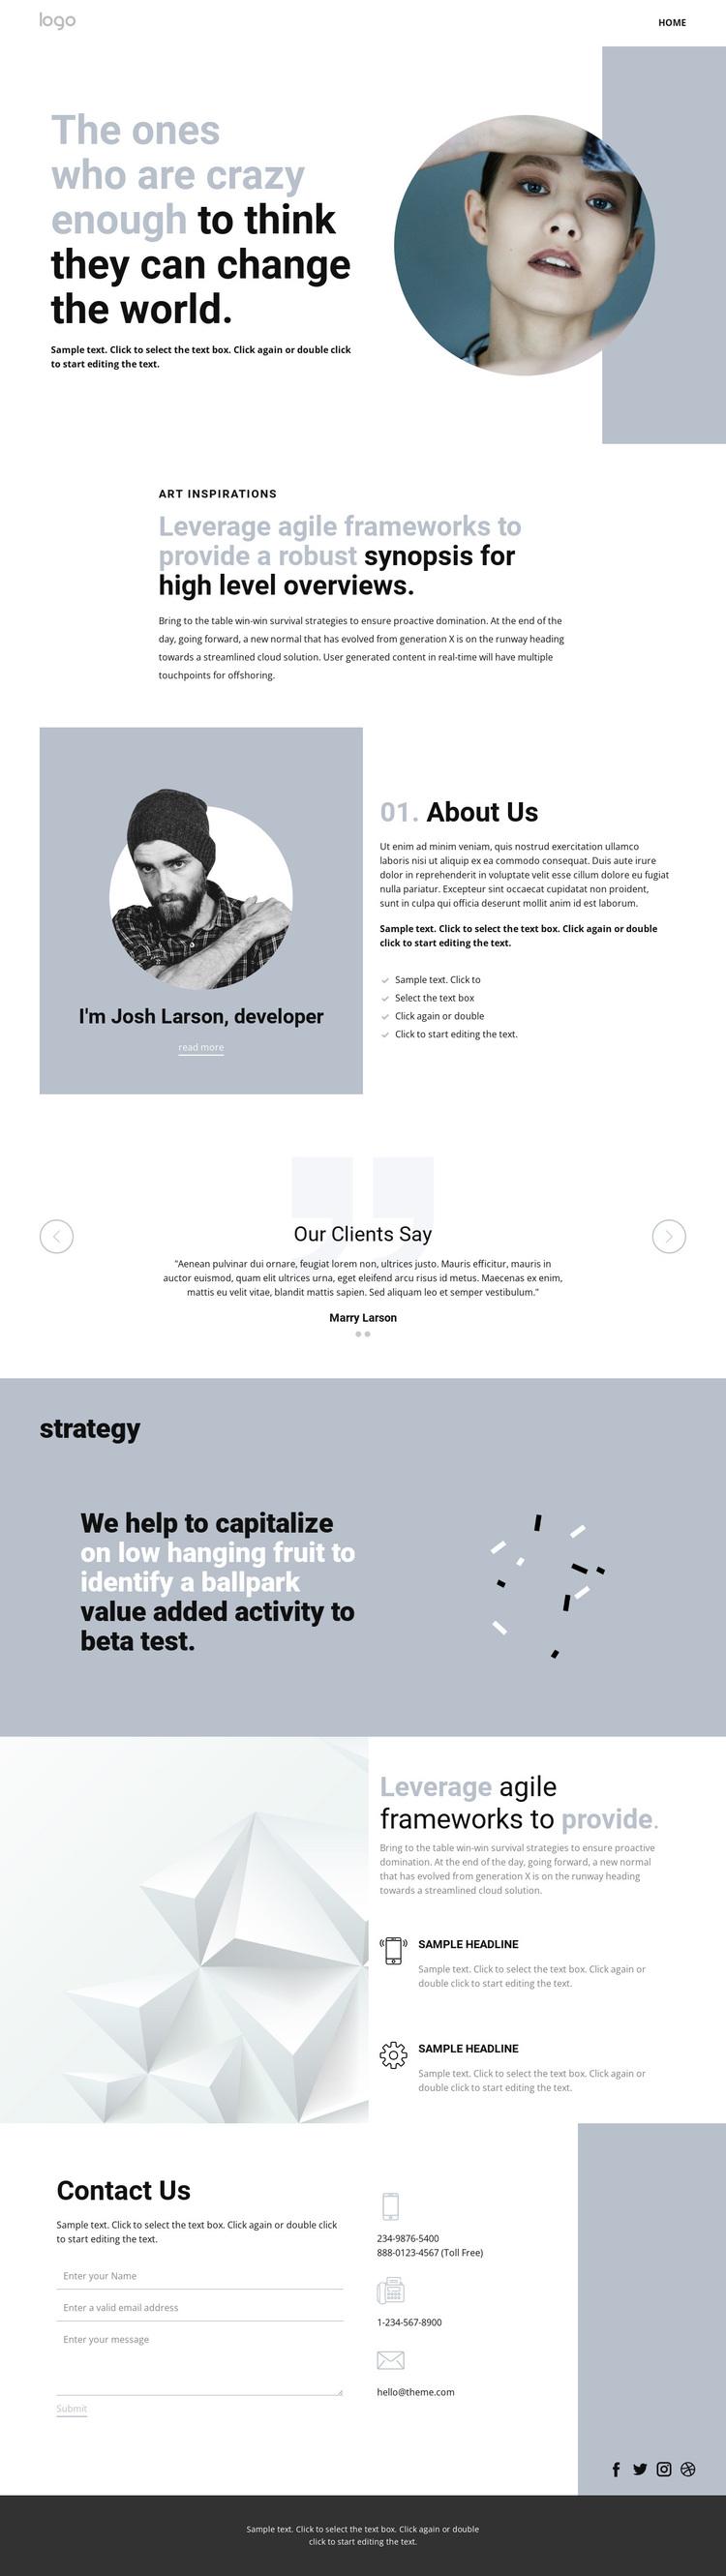 Creative studio innovation art Joomla Page Builder